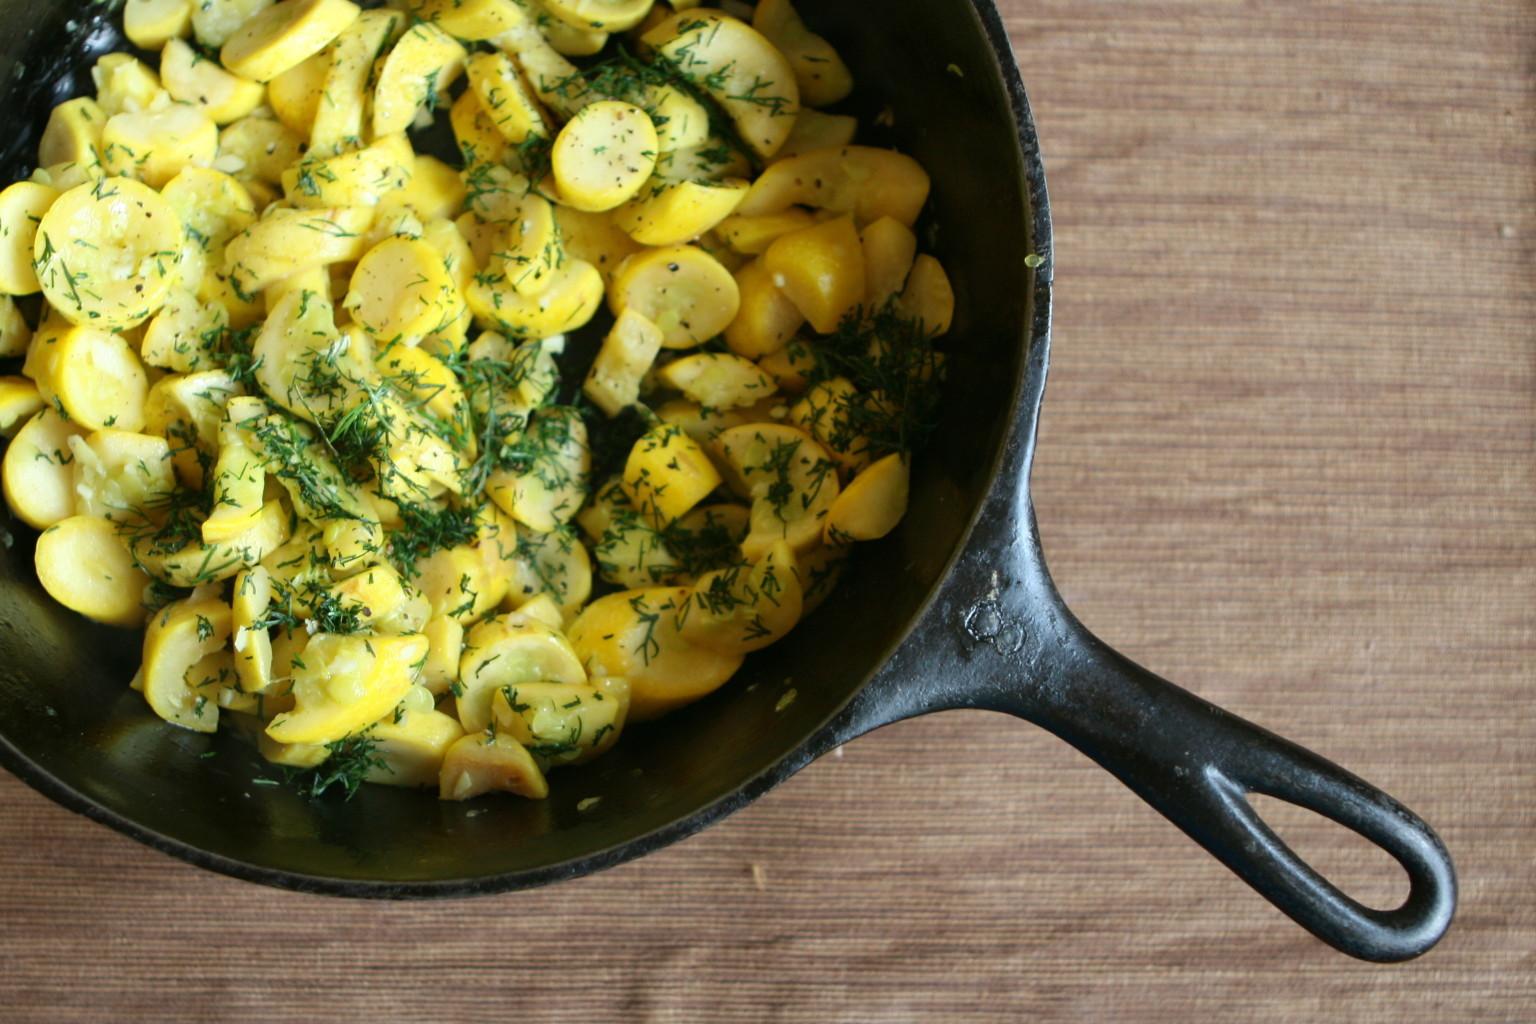 Summer Squash Recipes  Yellow Squash Recipes PHOTOS